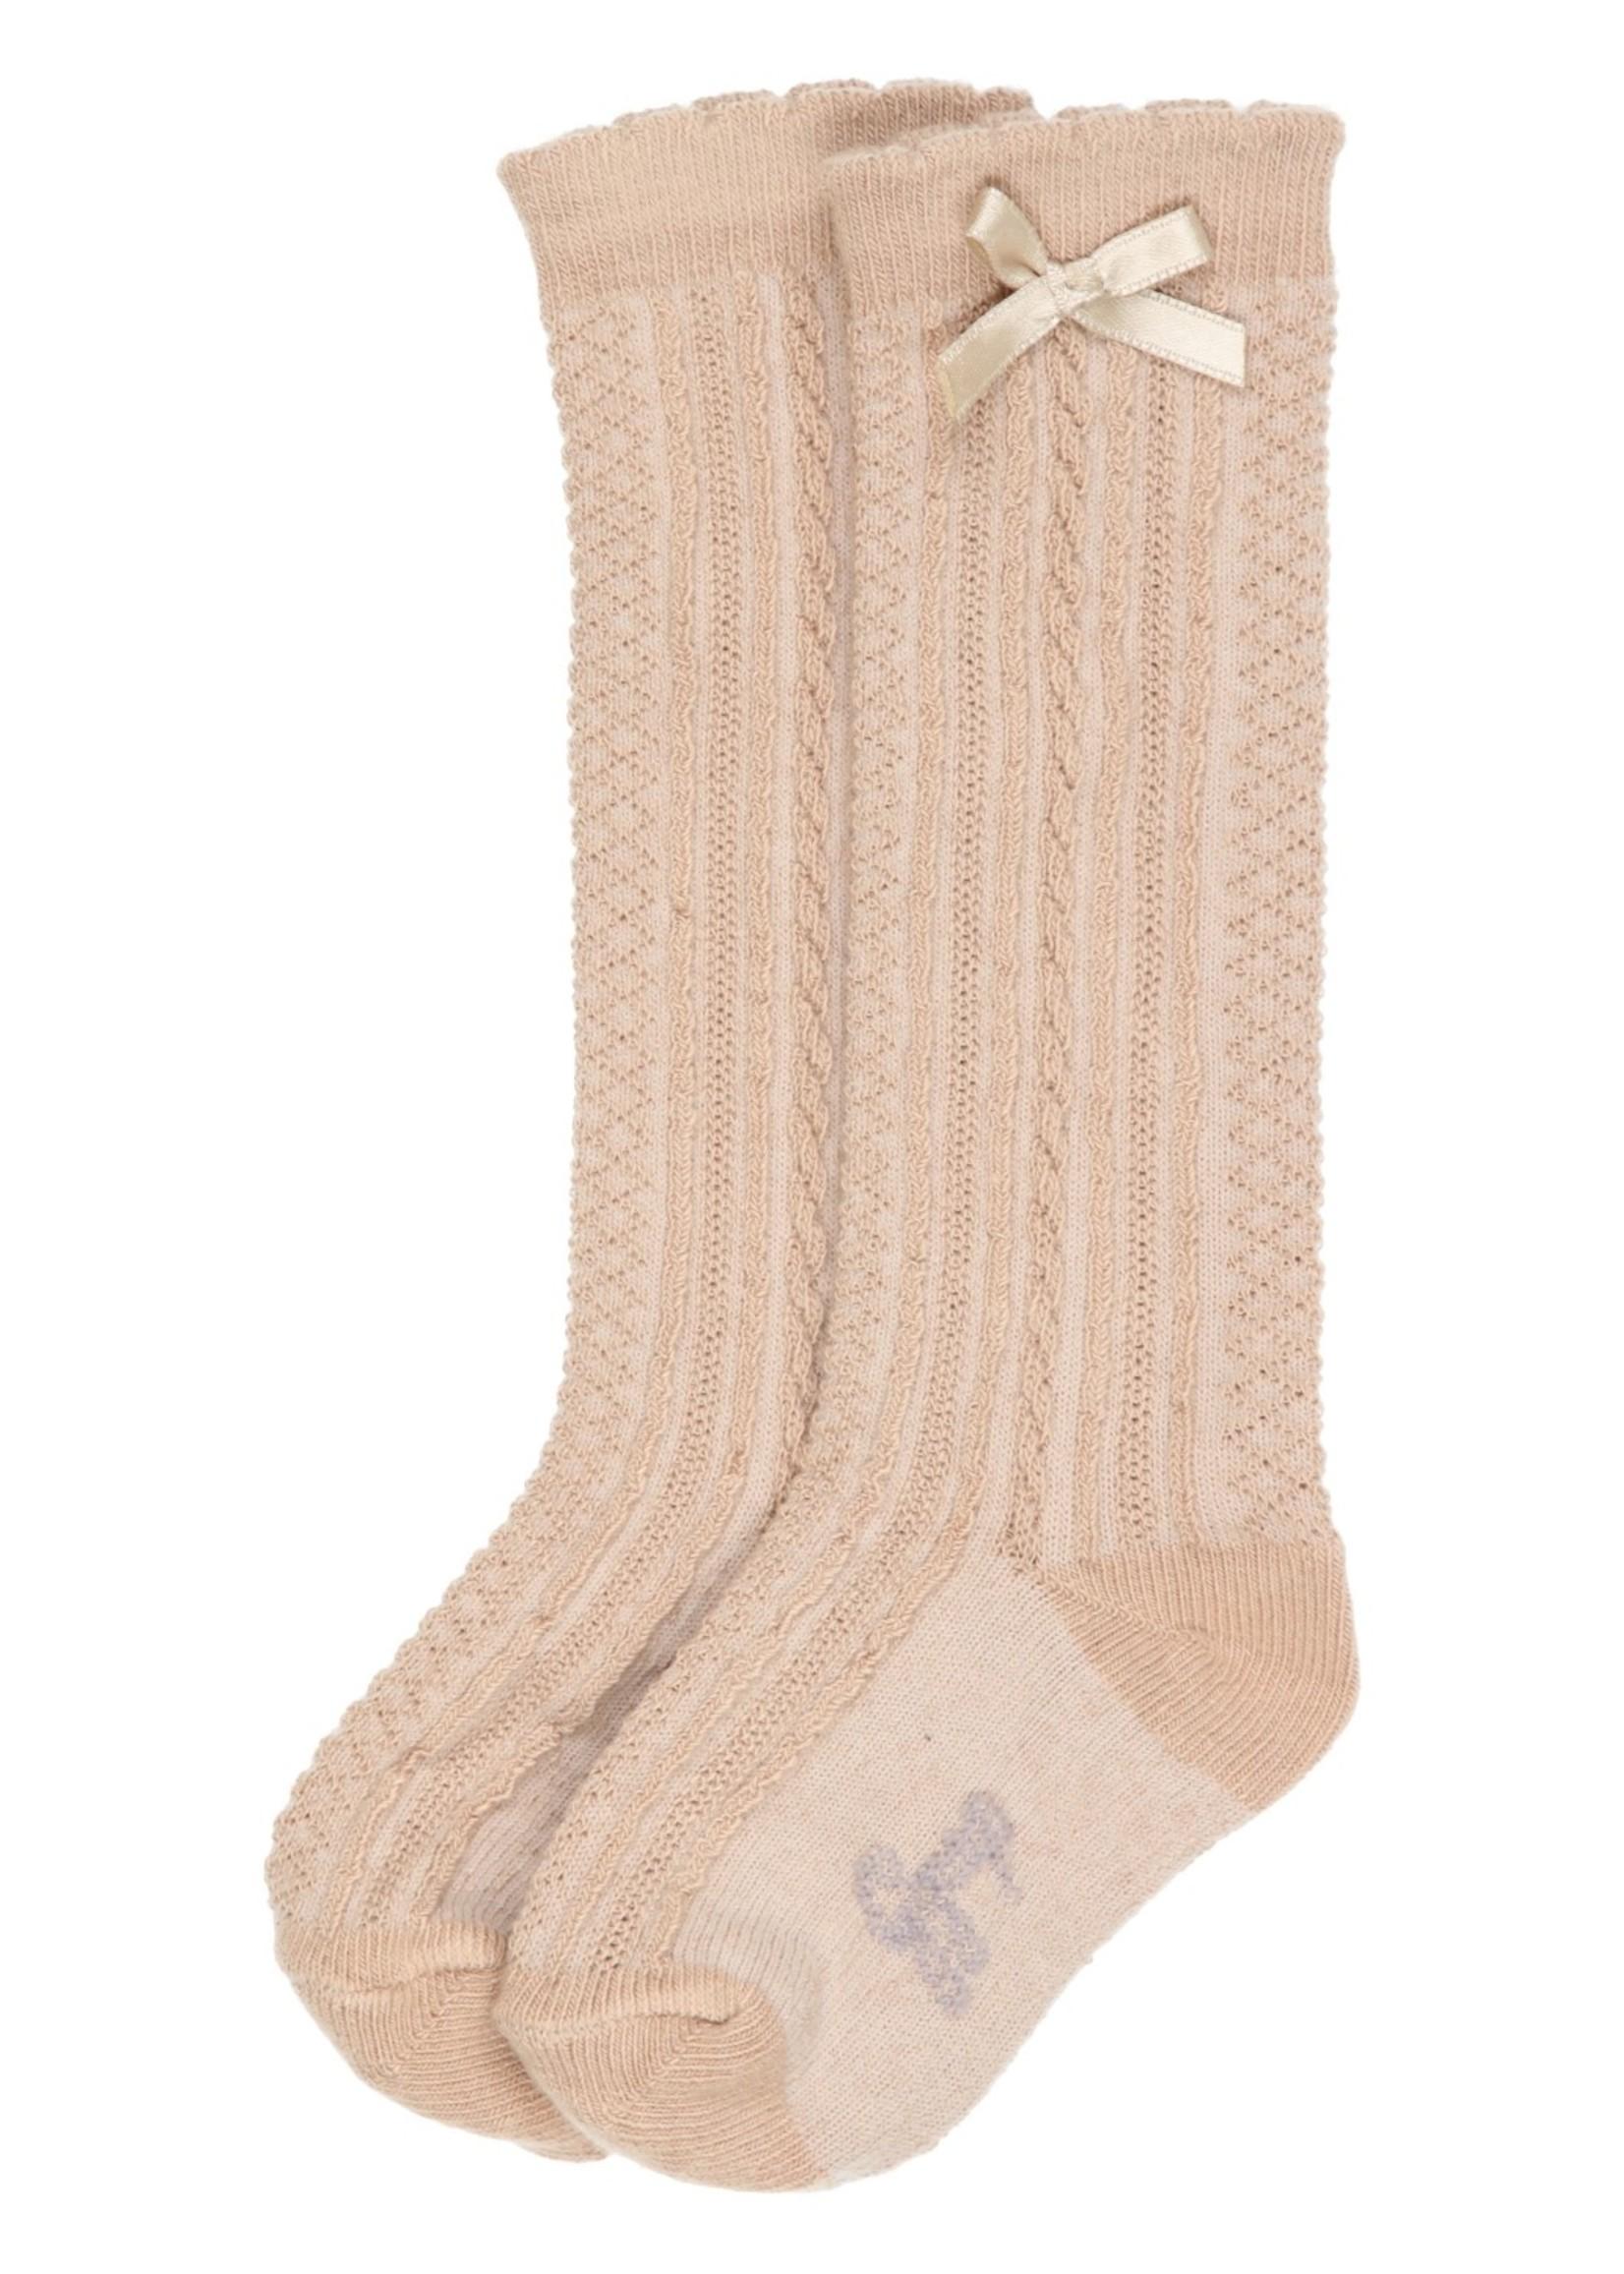 Gymp Gymp Girls knee socks camel